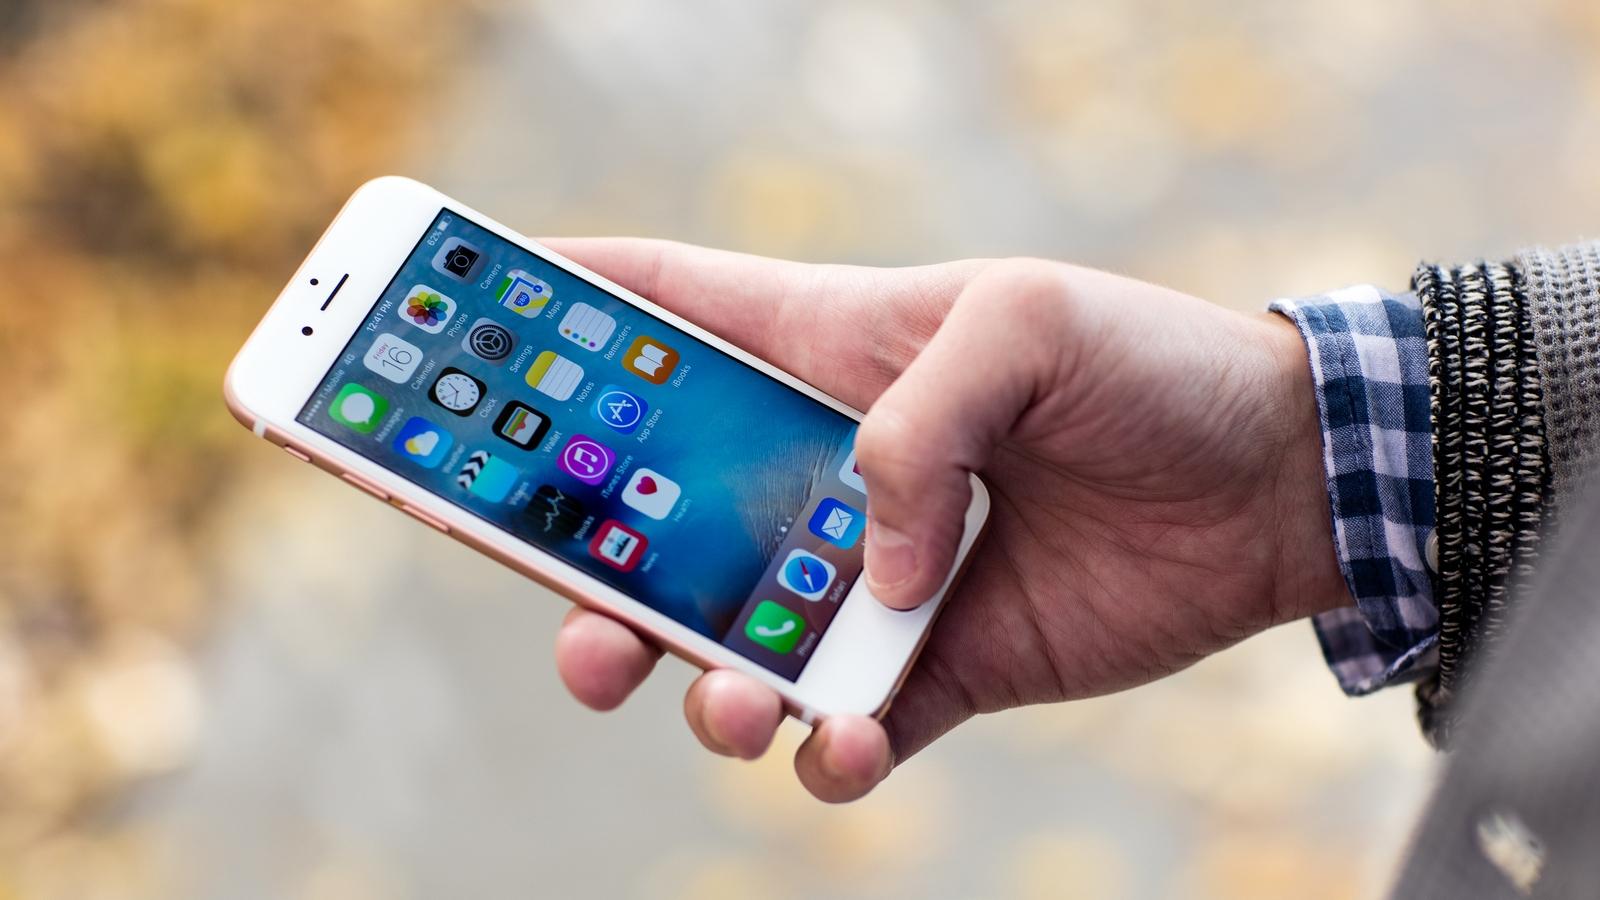 сравнение производительности iphone 6 и iphone 7